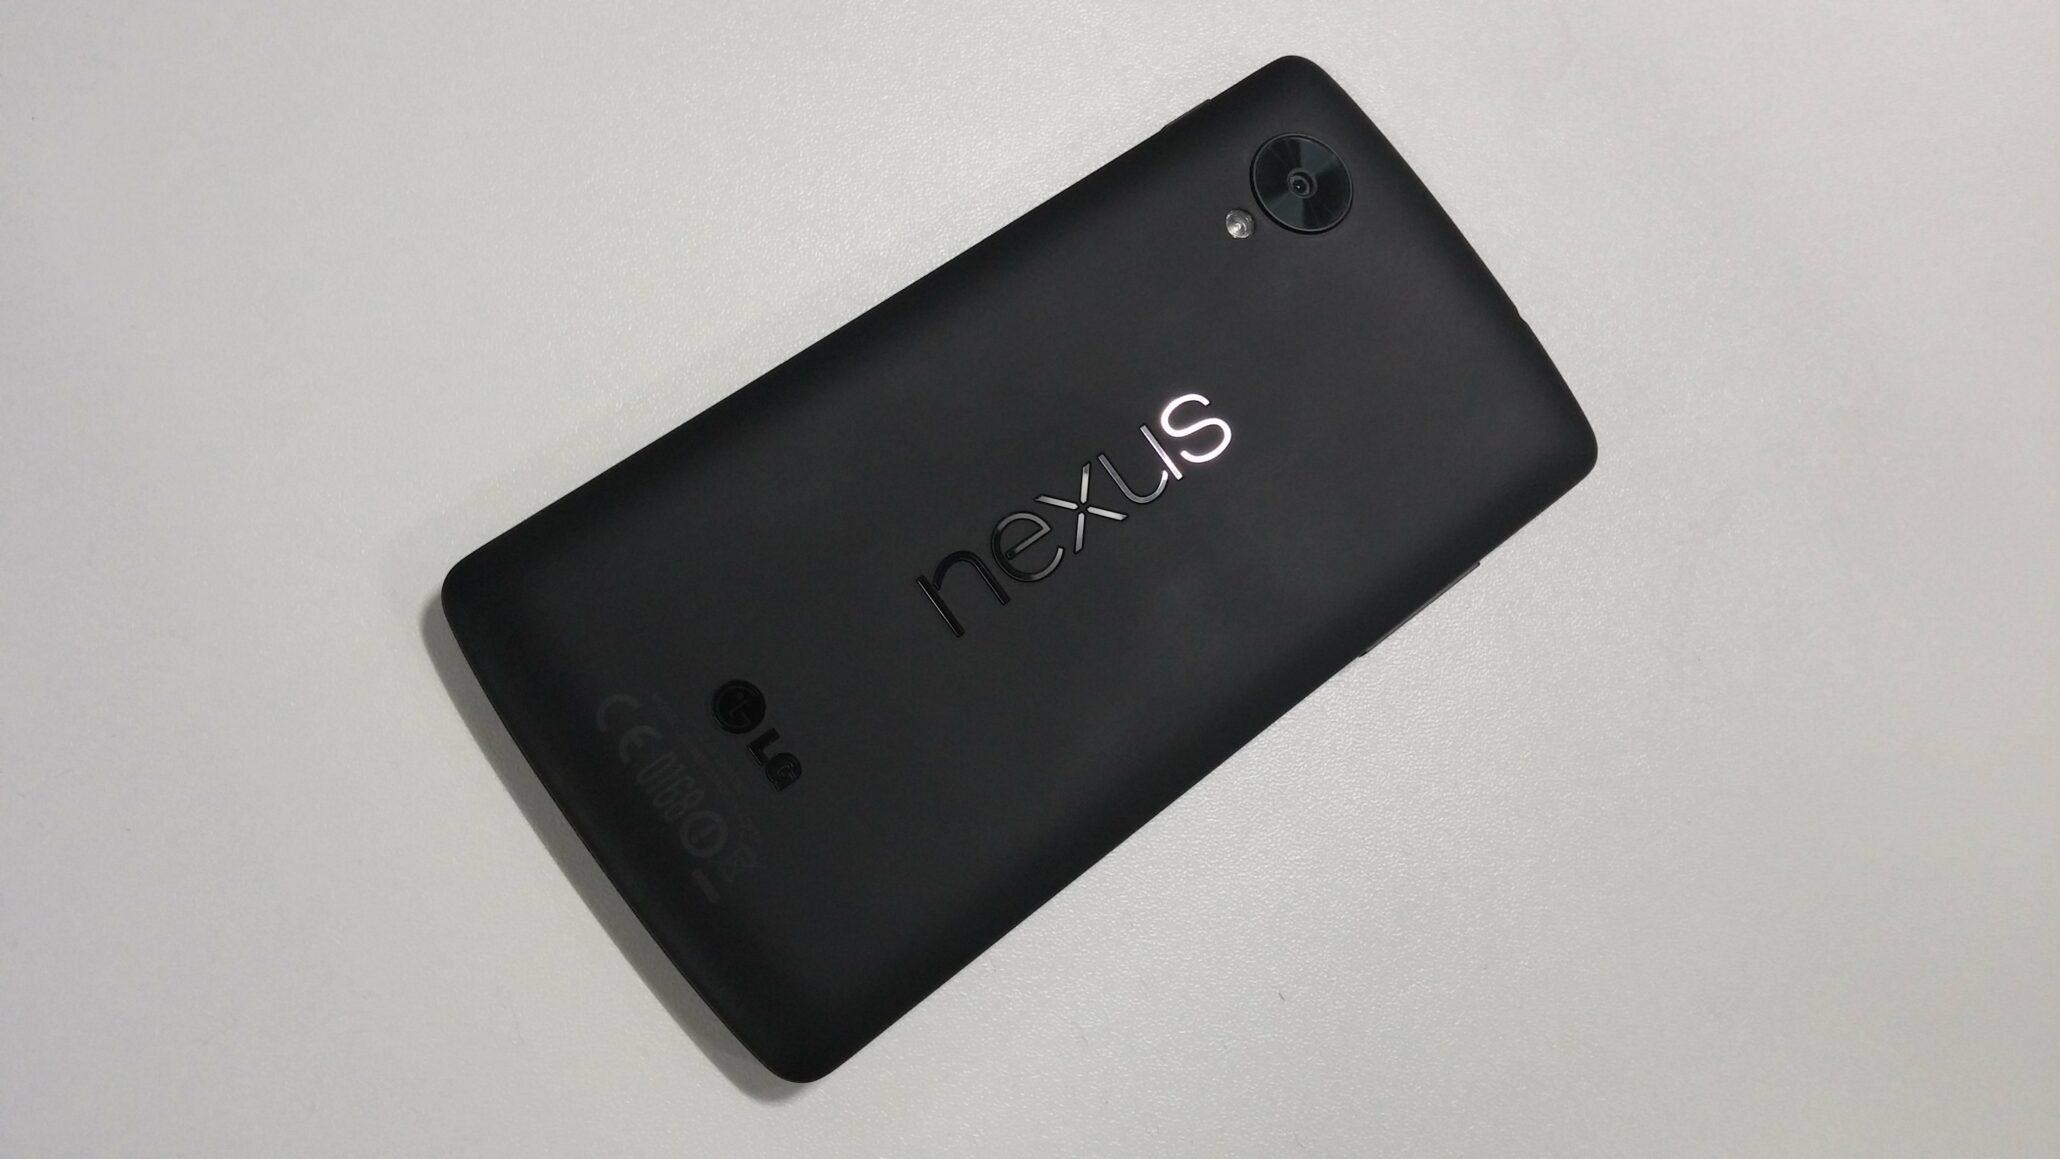 How to Flash NitrogenOS Android 7 Custom ROM on LG Nexus 5